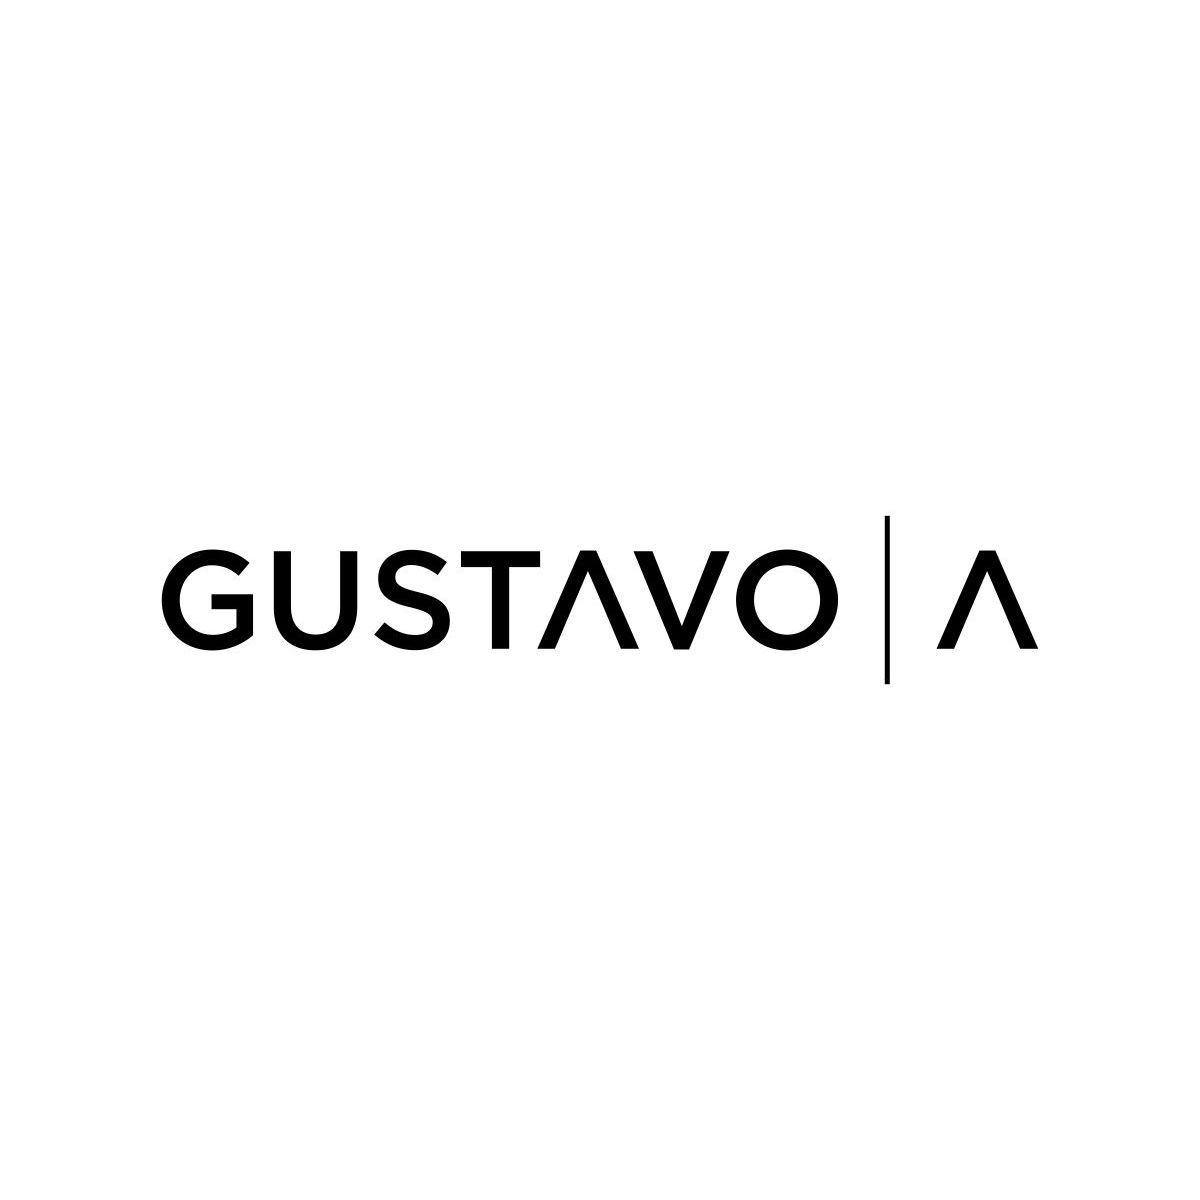 Gustavo A